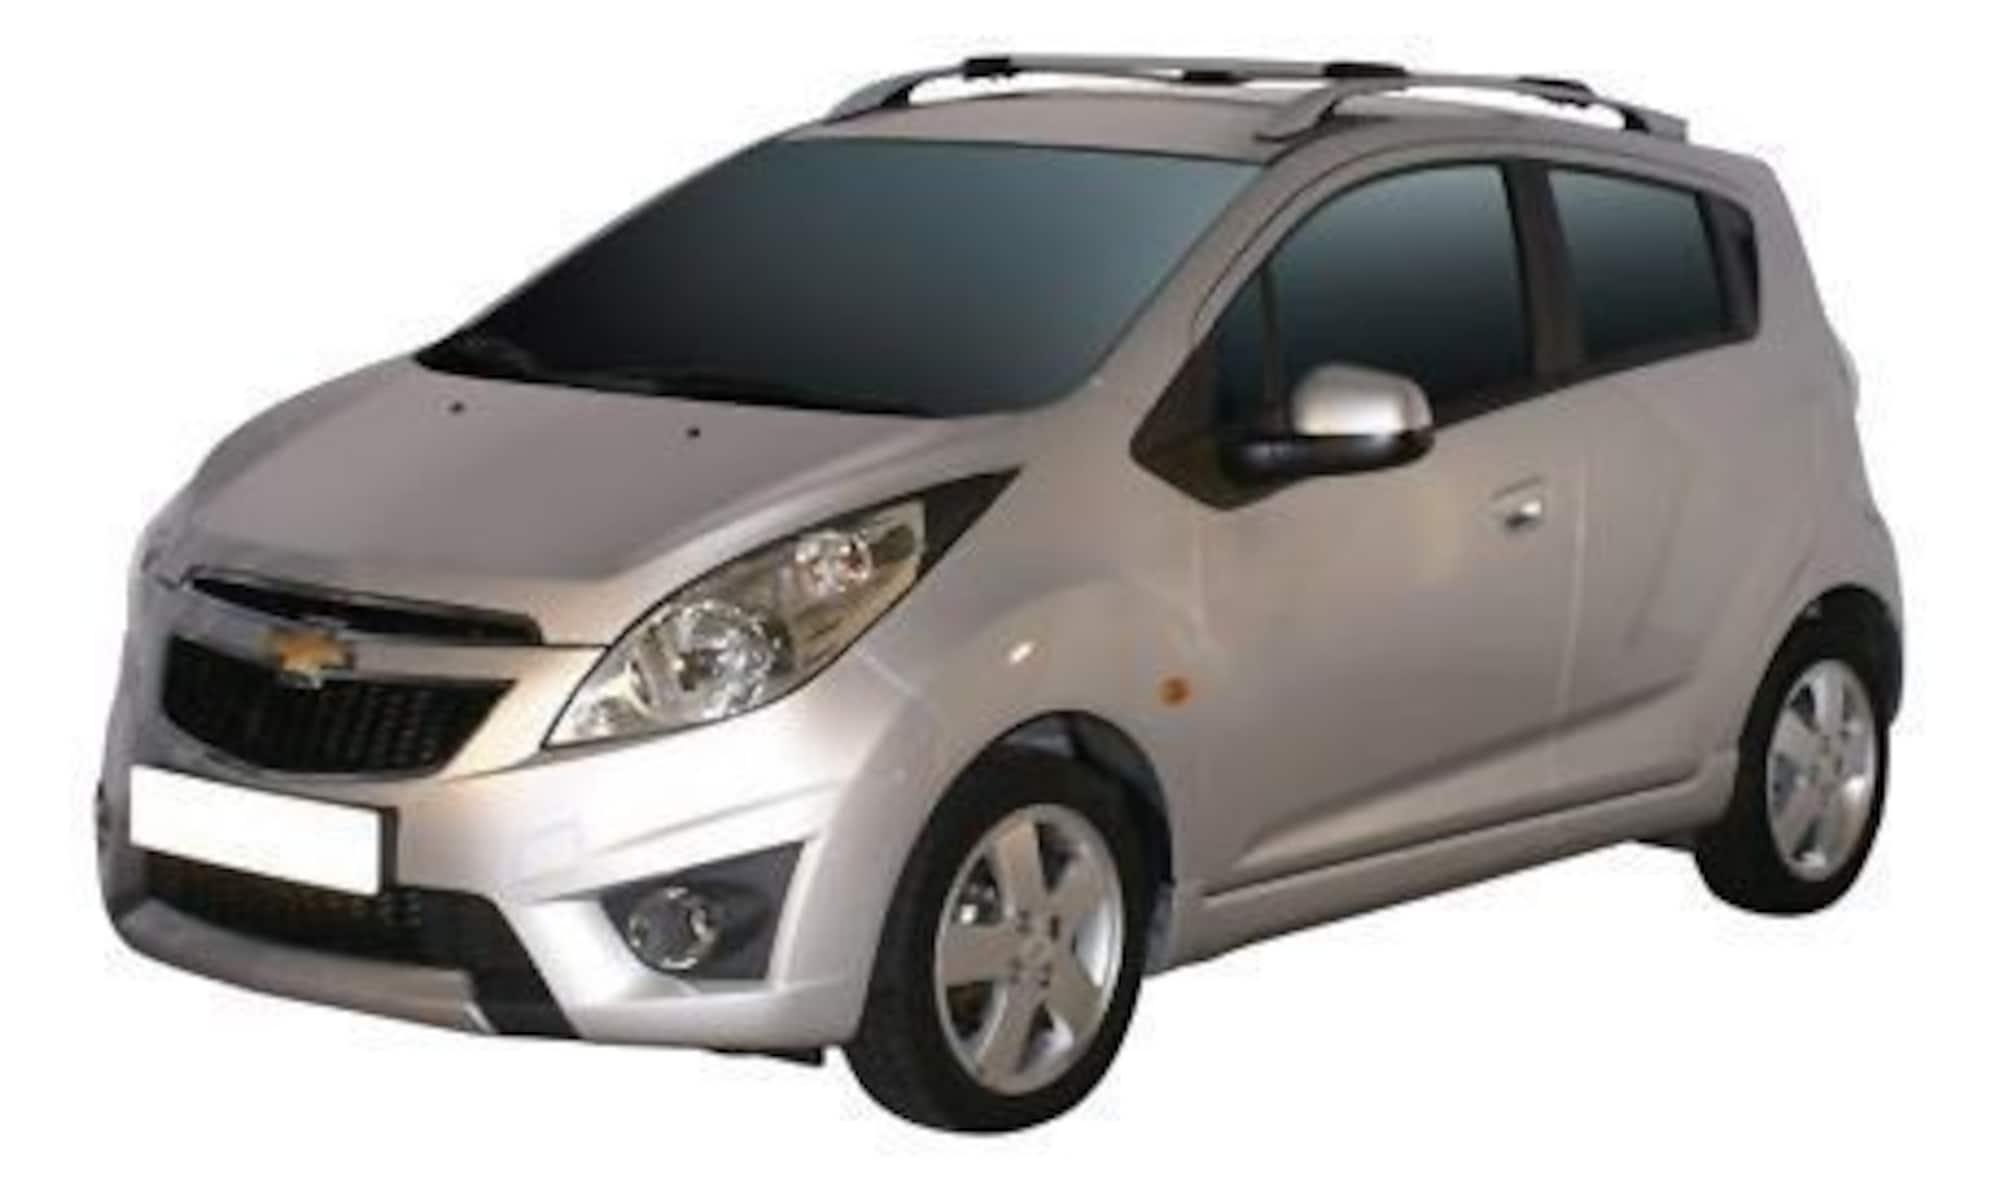 Chevrolet Spark, Nissan Micra, Suzuki Alto